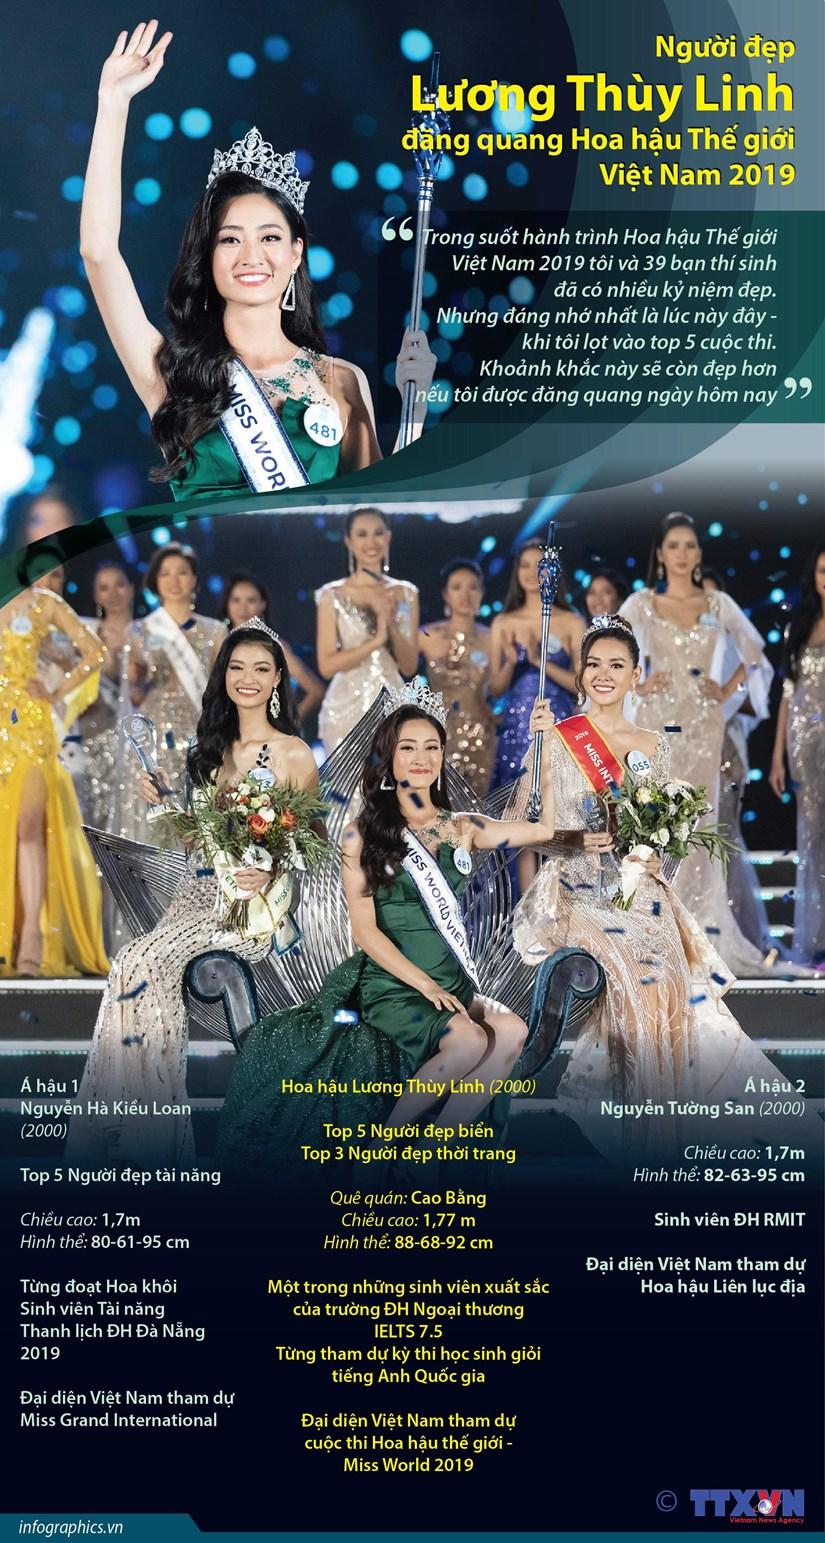 [Infographic] Miss World Viet Nam thuoc ve nguoi dep den tu Cao Bang hinh anh 1